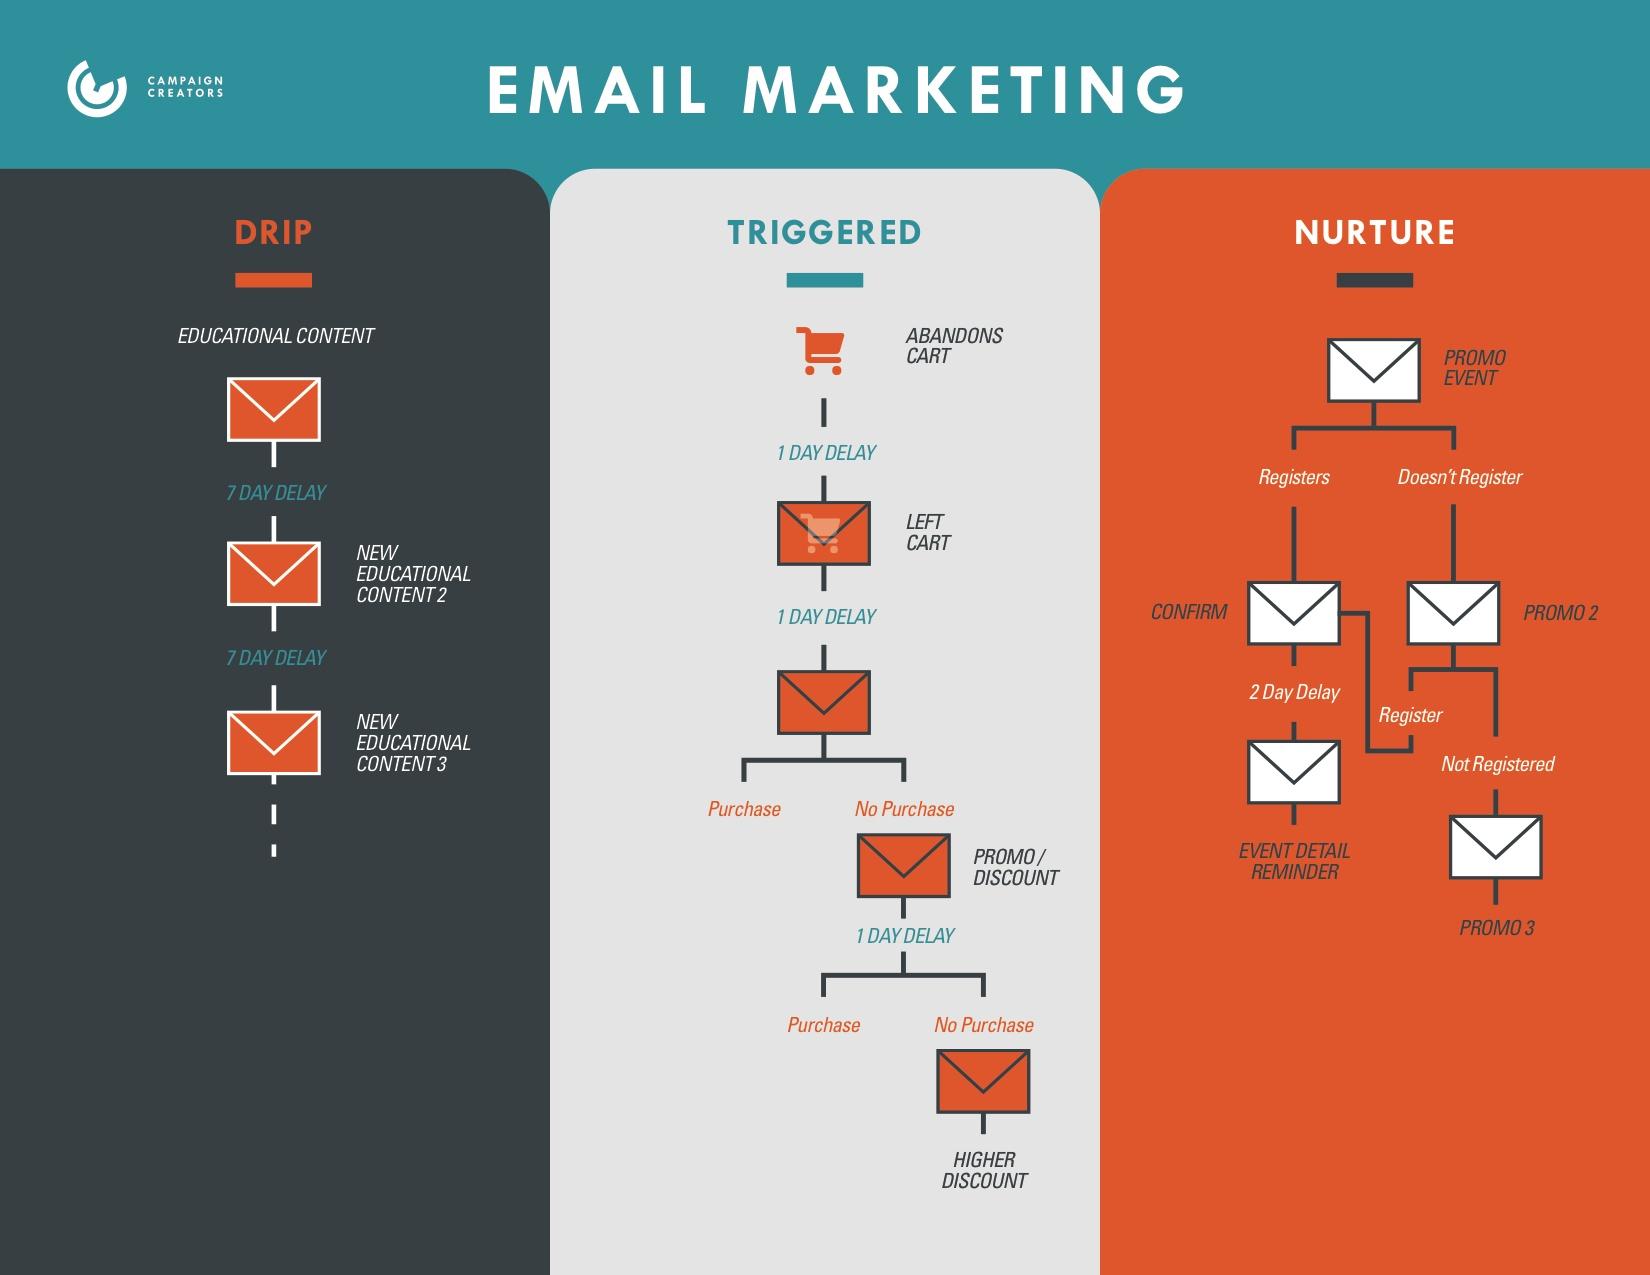 CampaignCreators-Email-Marketing-Diagram.jpg